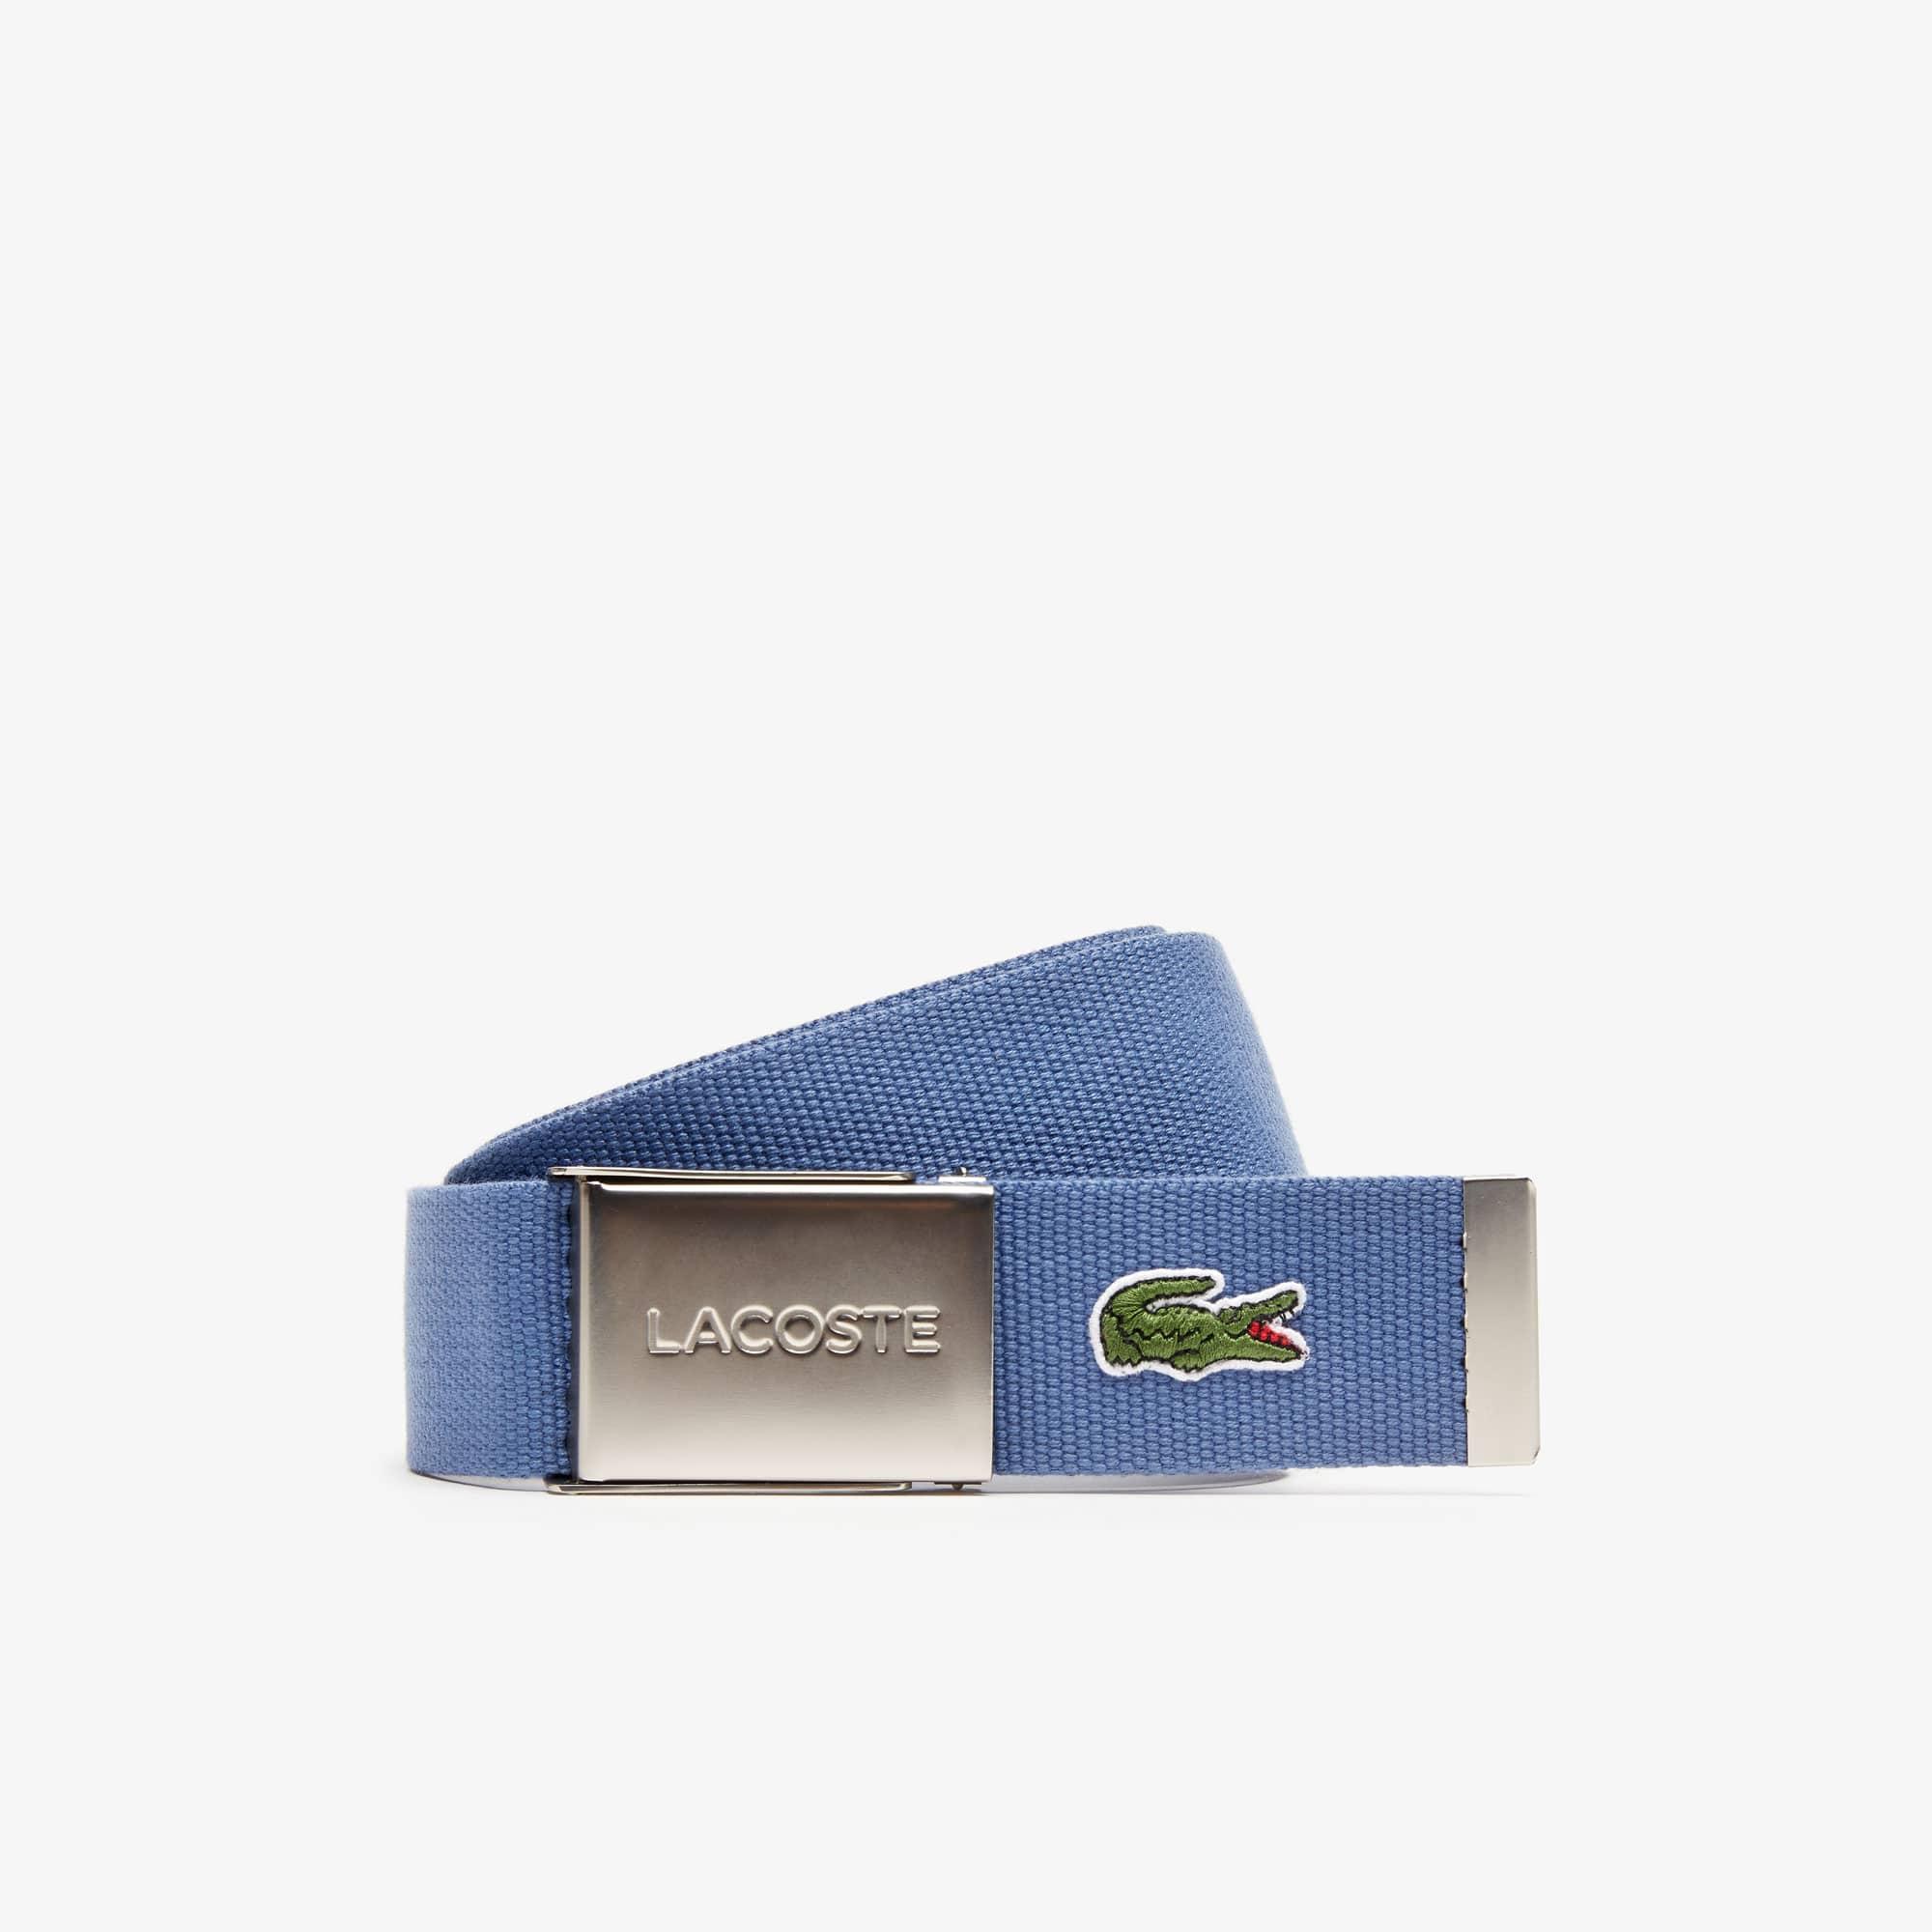 88a75d4a85967e Polos, Kleidung und Lederwaren Online | LACOSTE